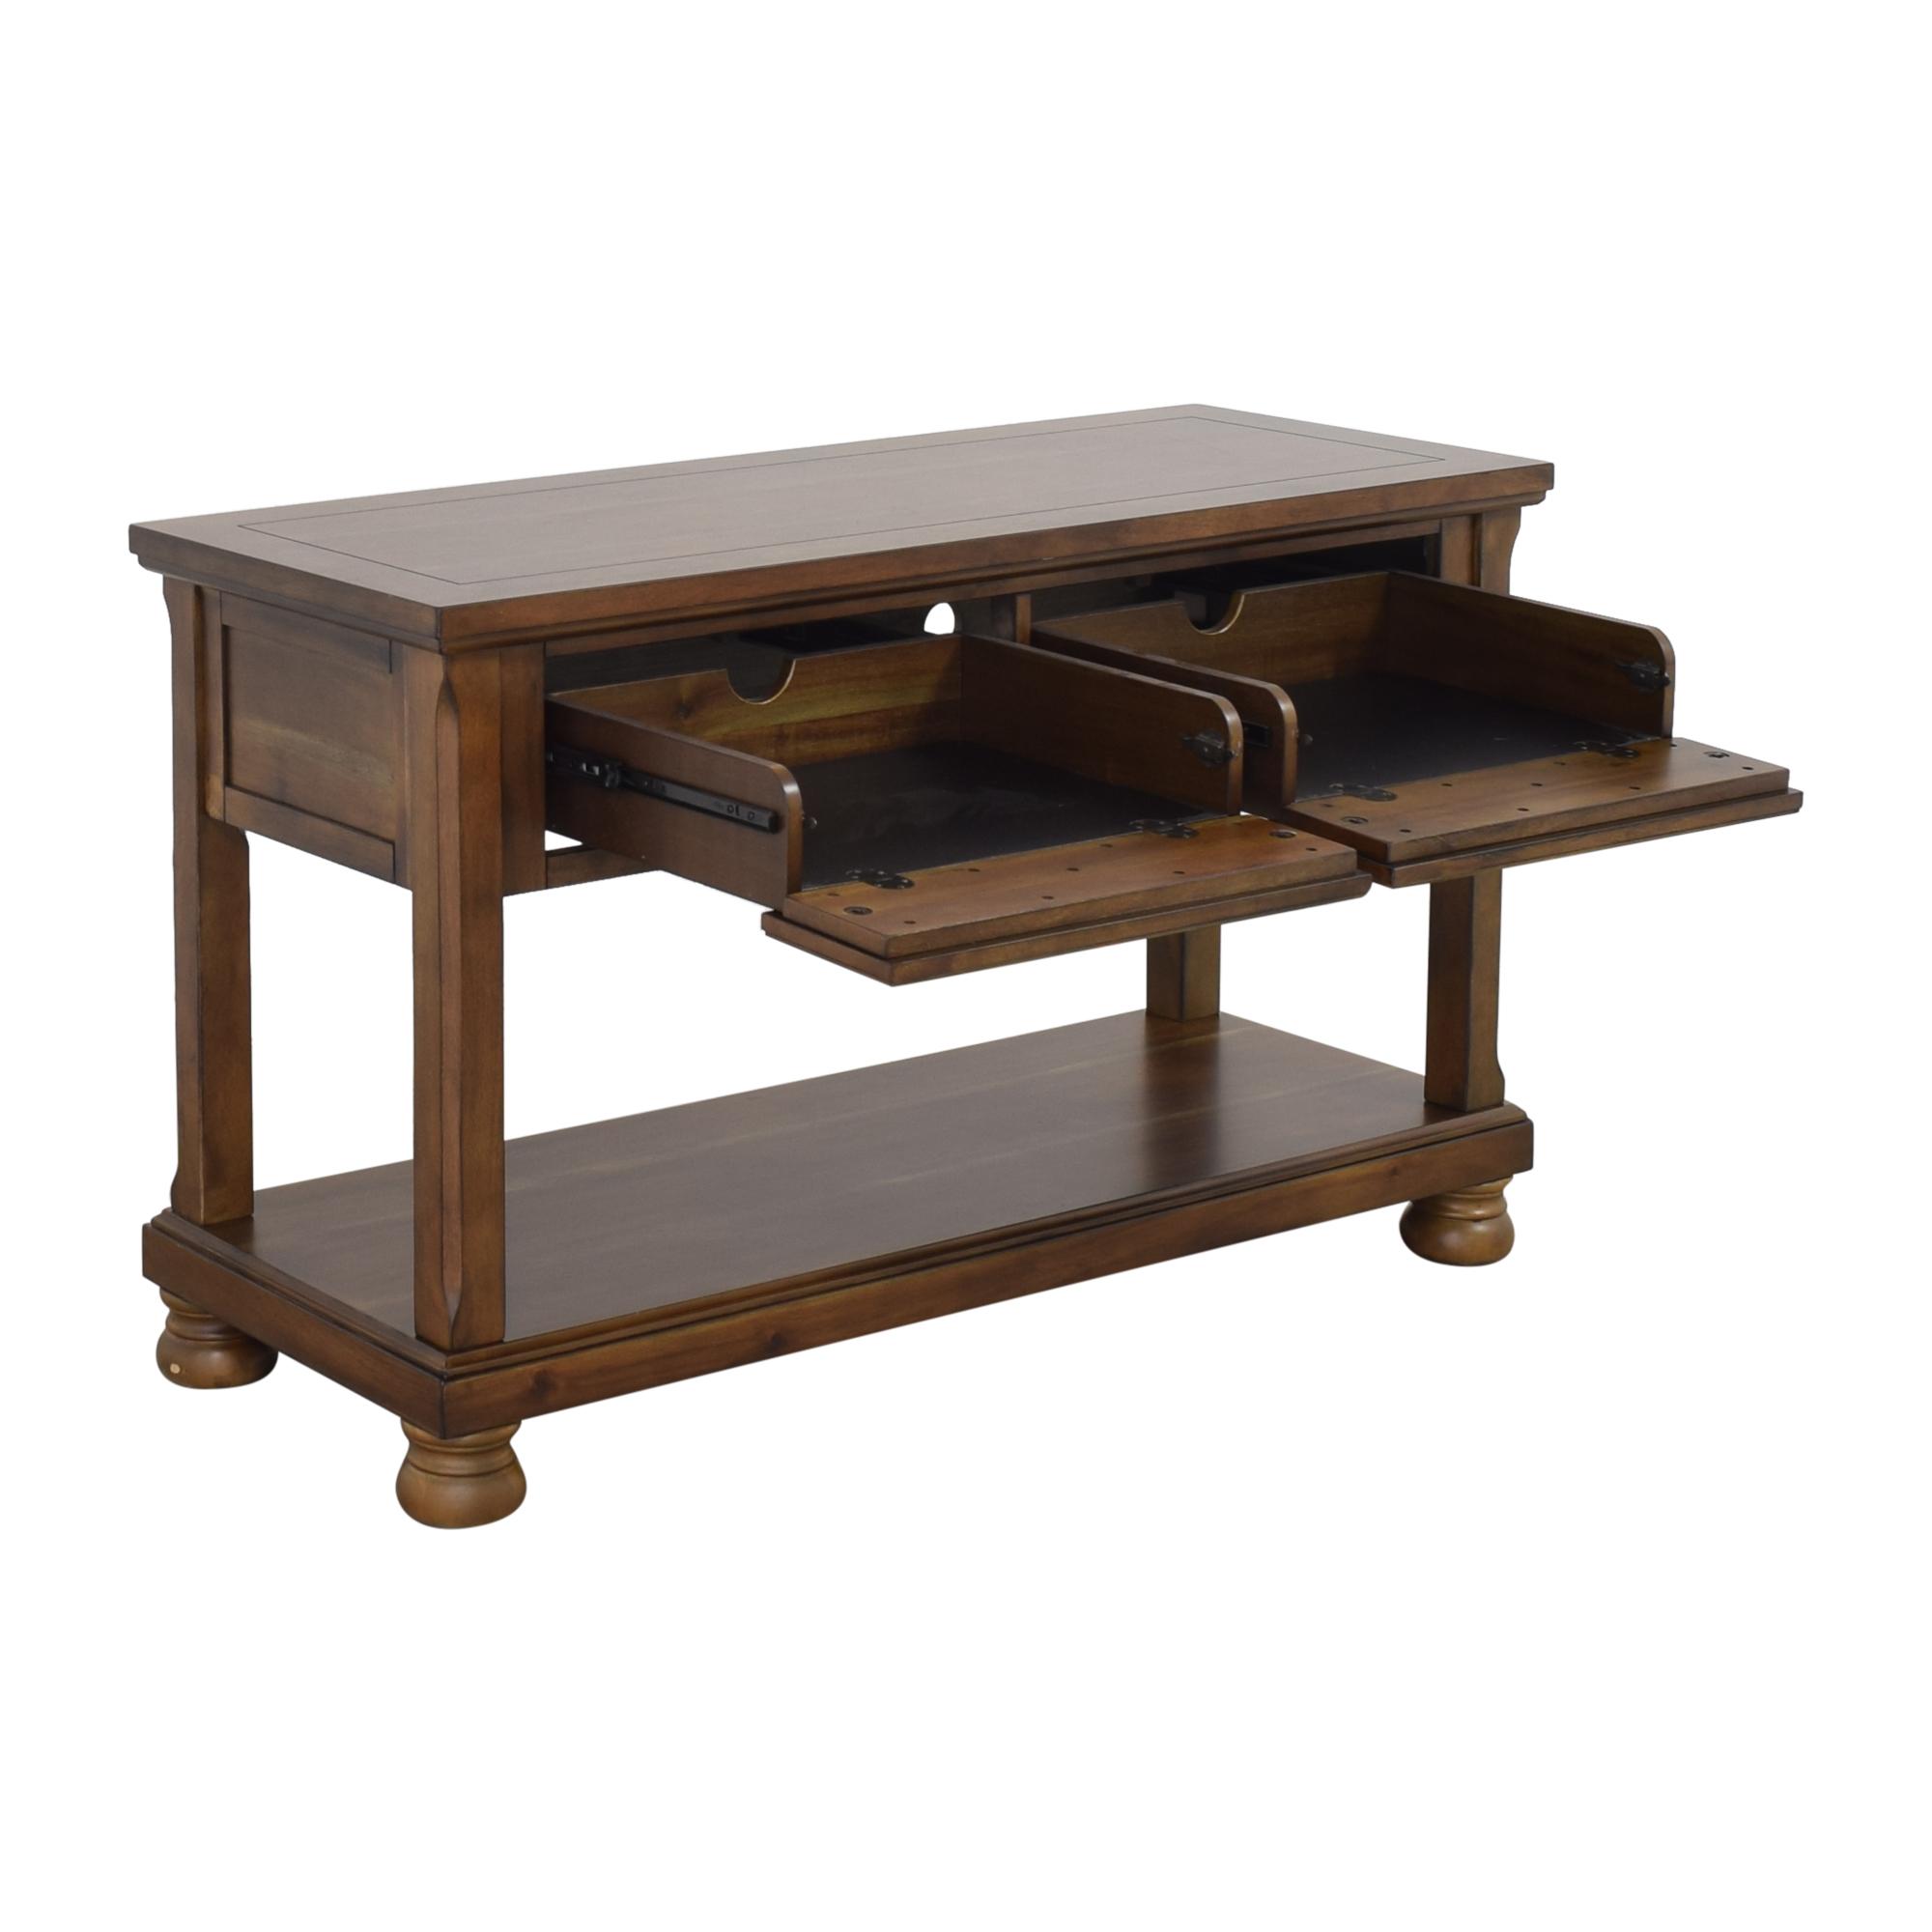 Ashley Furniture Porter Console Table sale